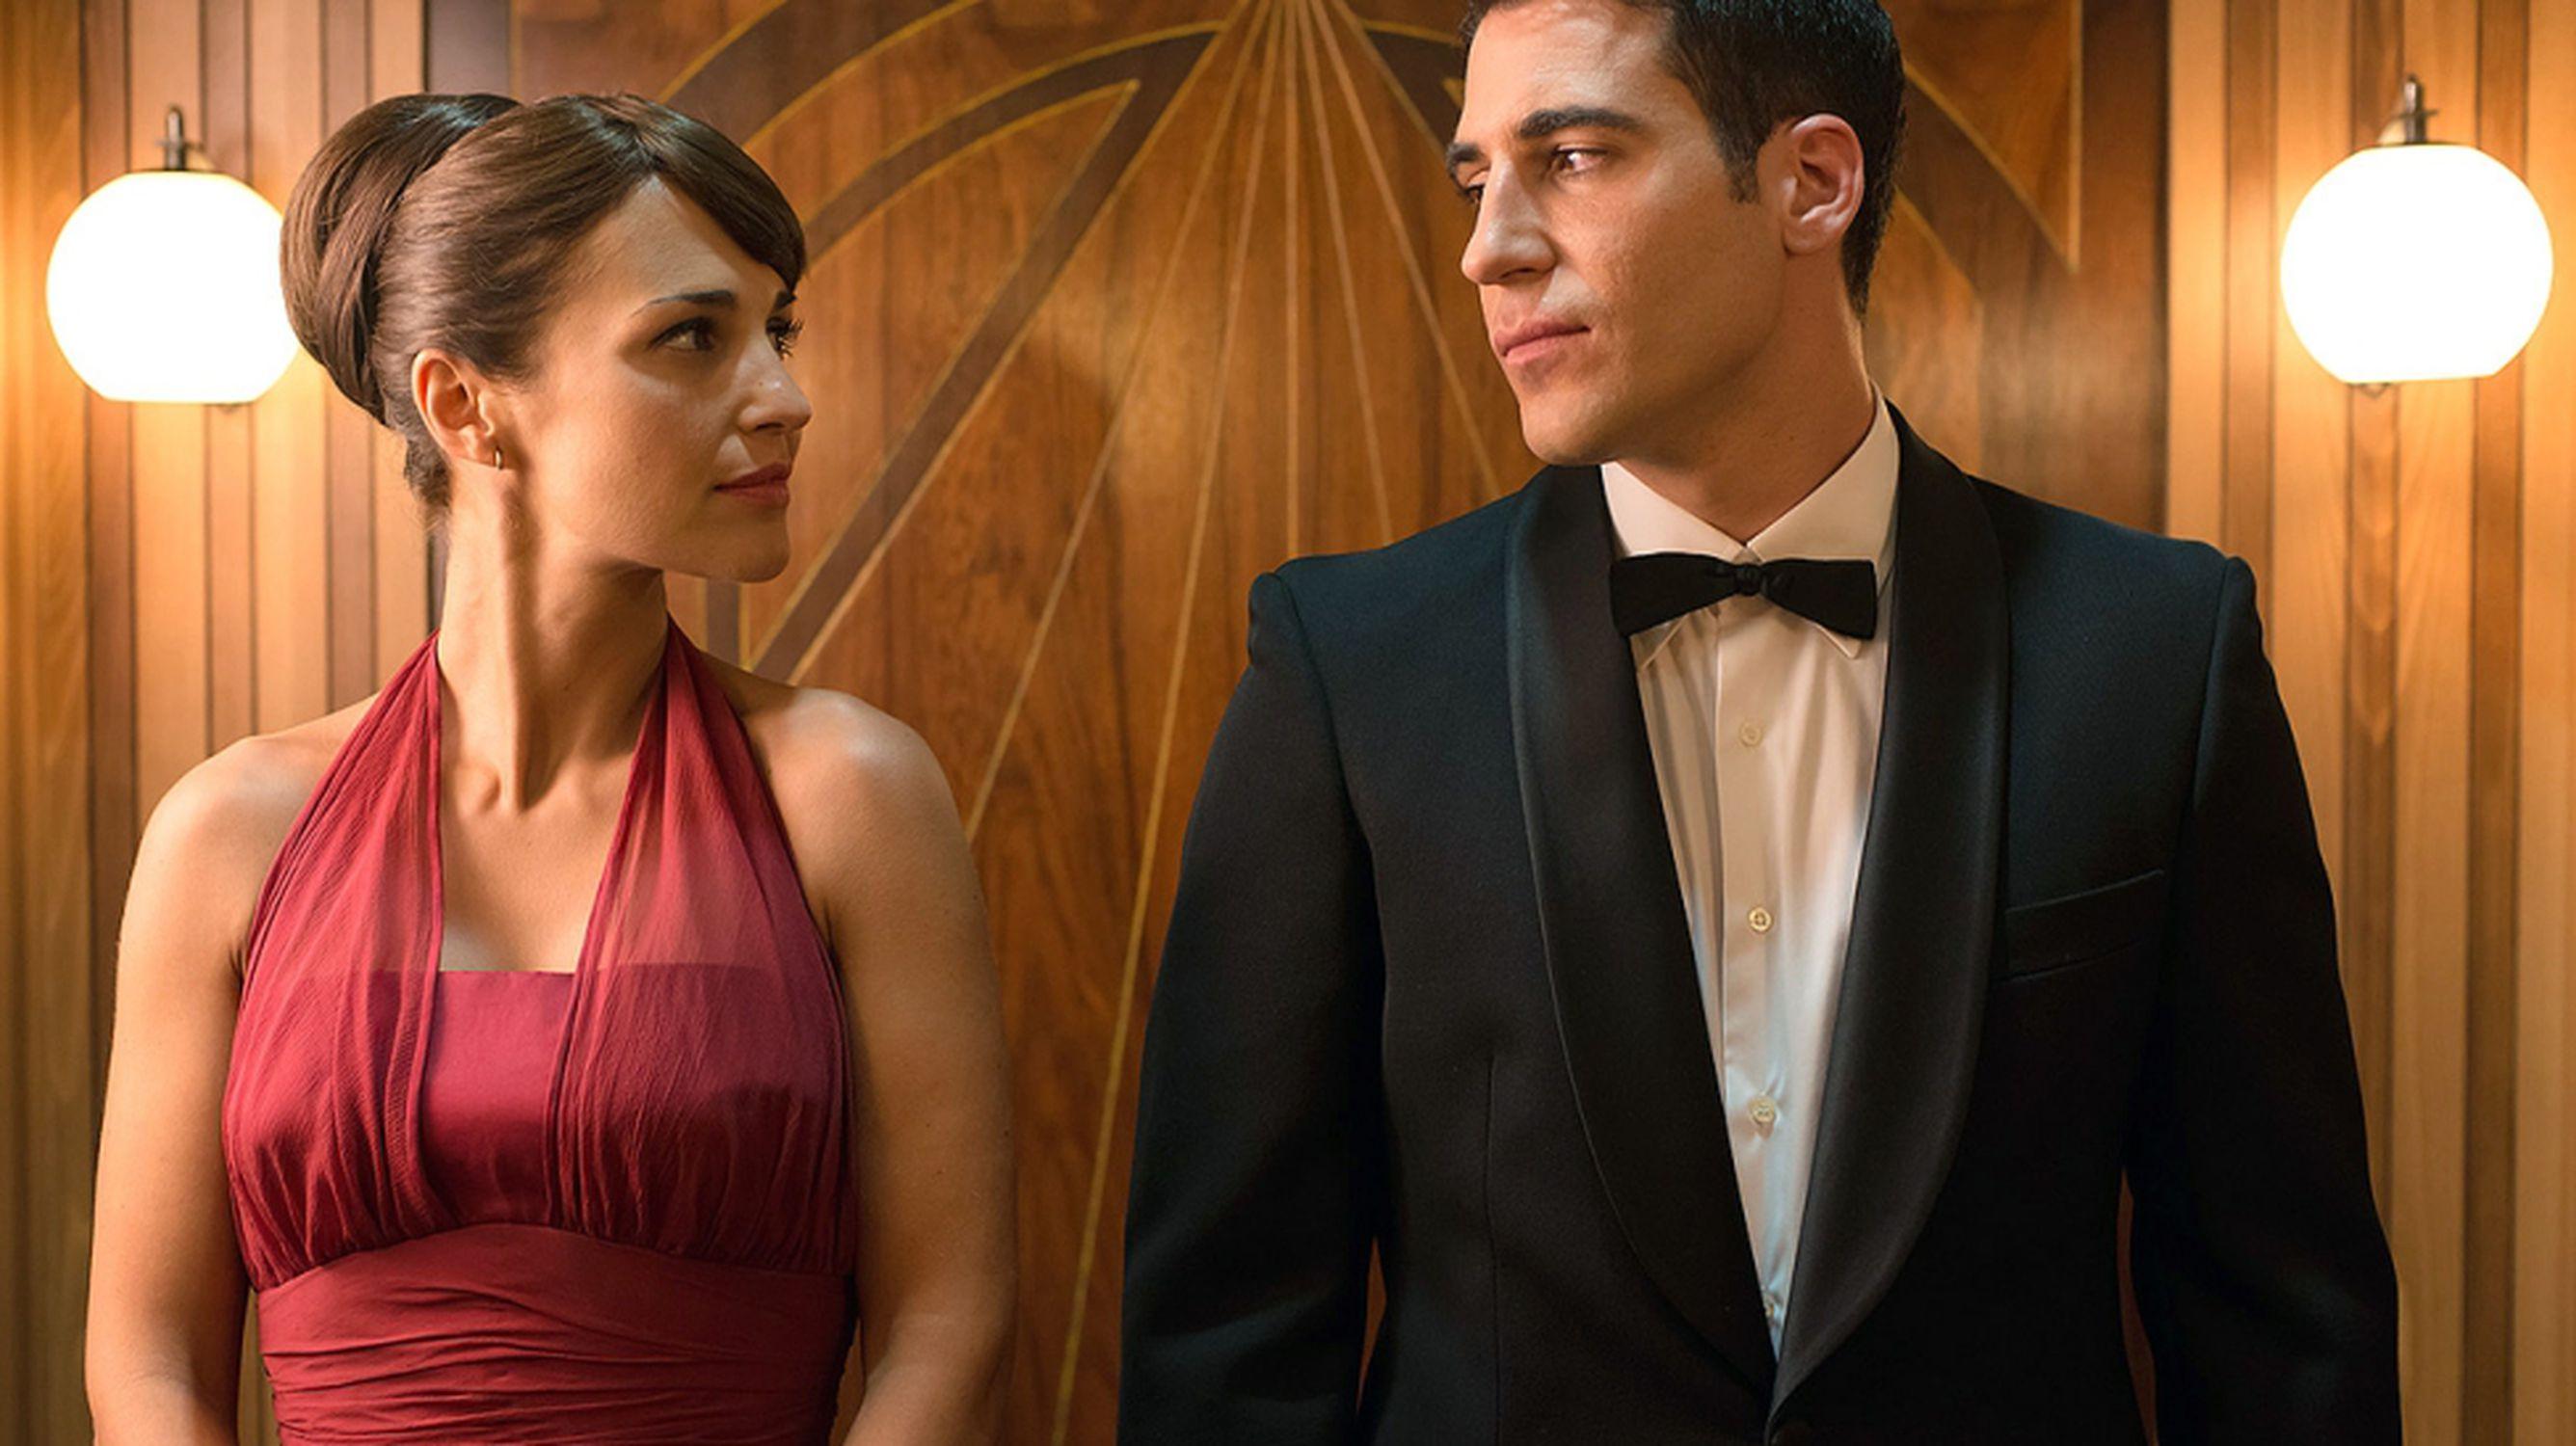 The 5 best Spanish period dramas on Netflix: 'Gran Hotel